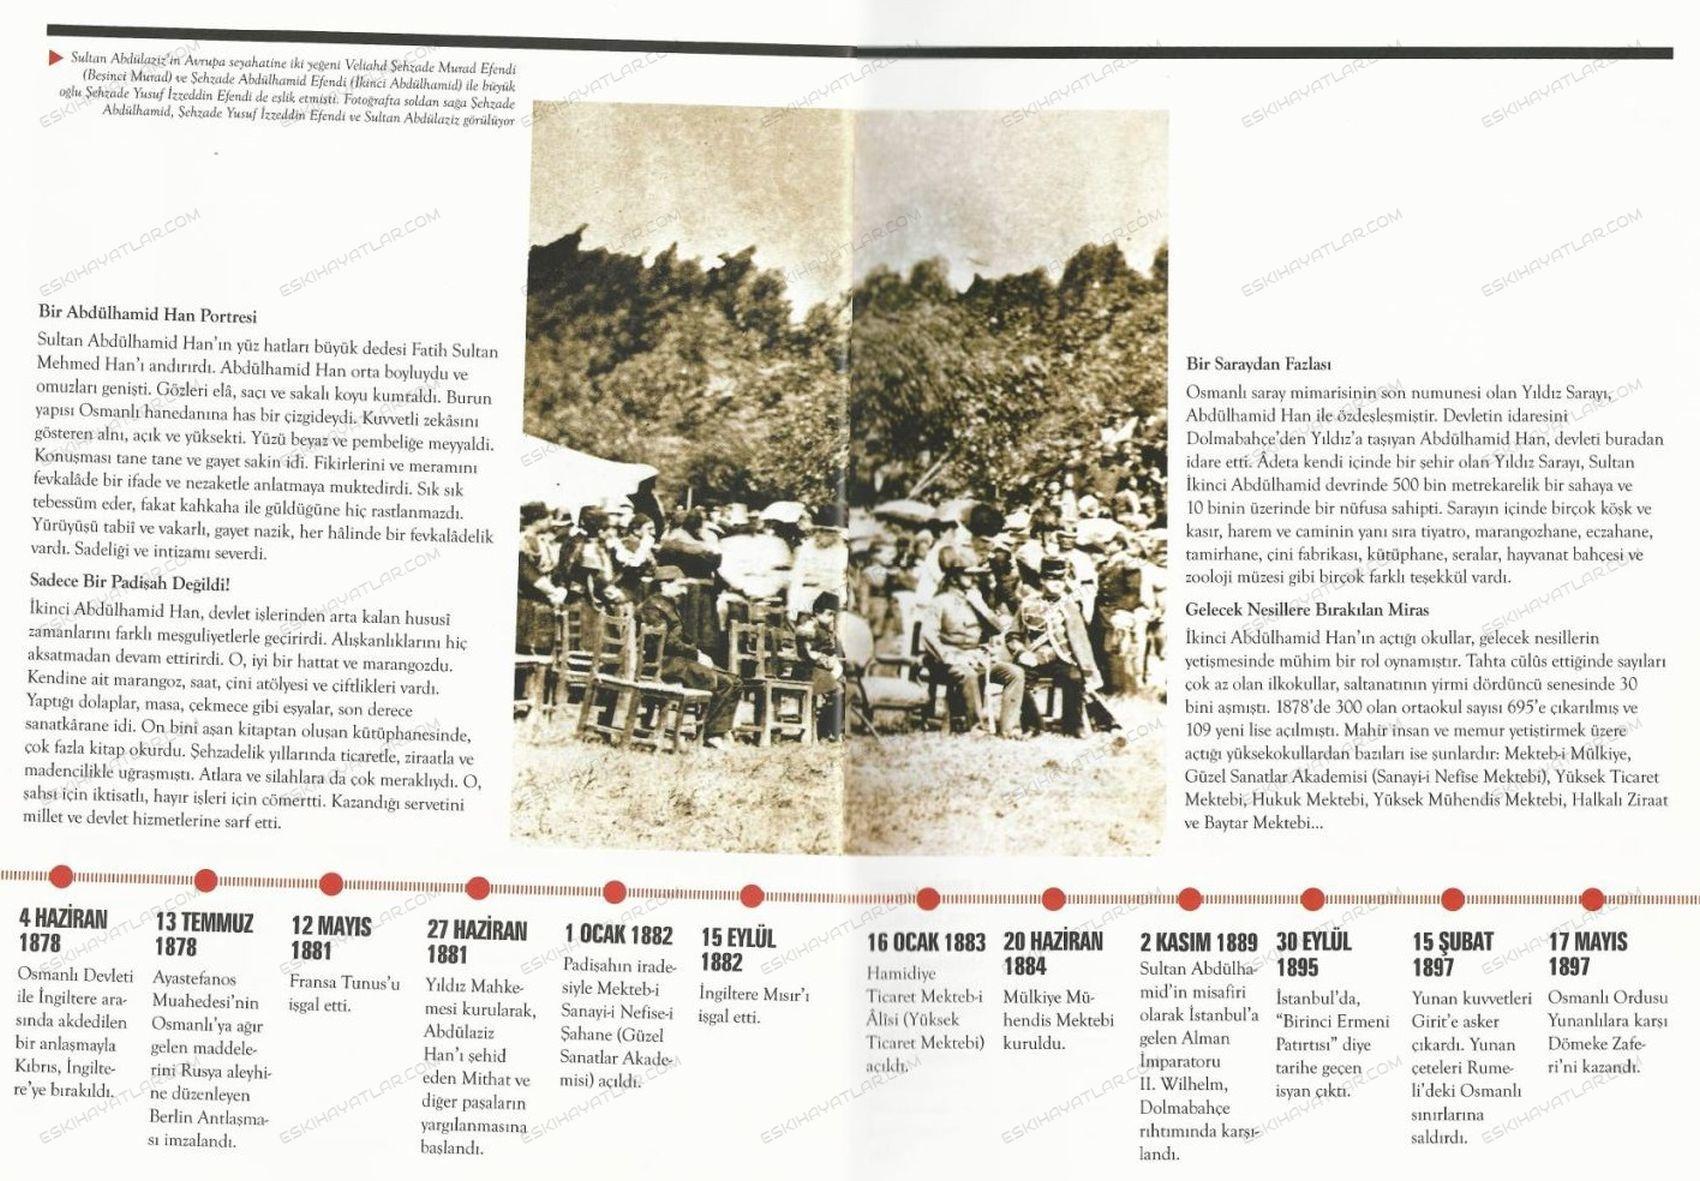 0369-sultan-abdulhamid-vefatinin-100-yili-yedi-kita-dergisi-abdulhamid-belgeseli (8)